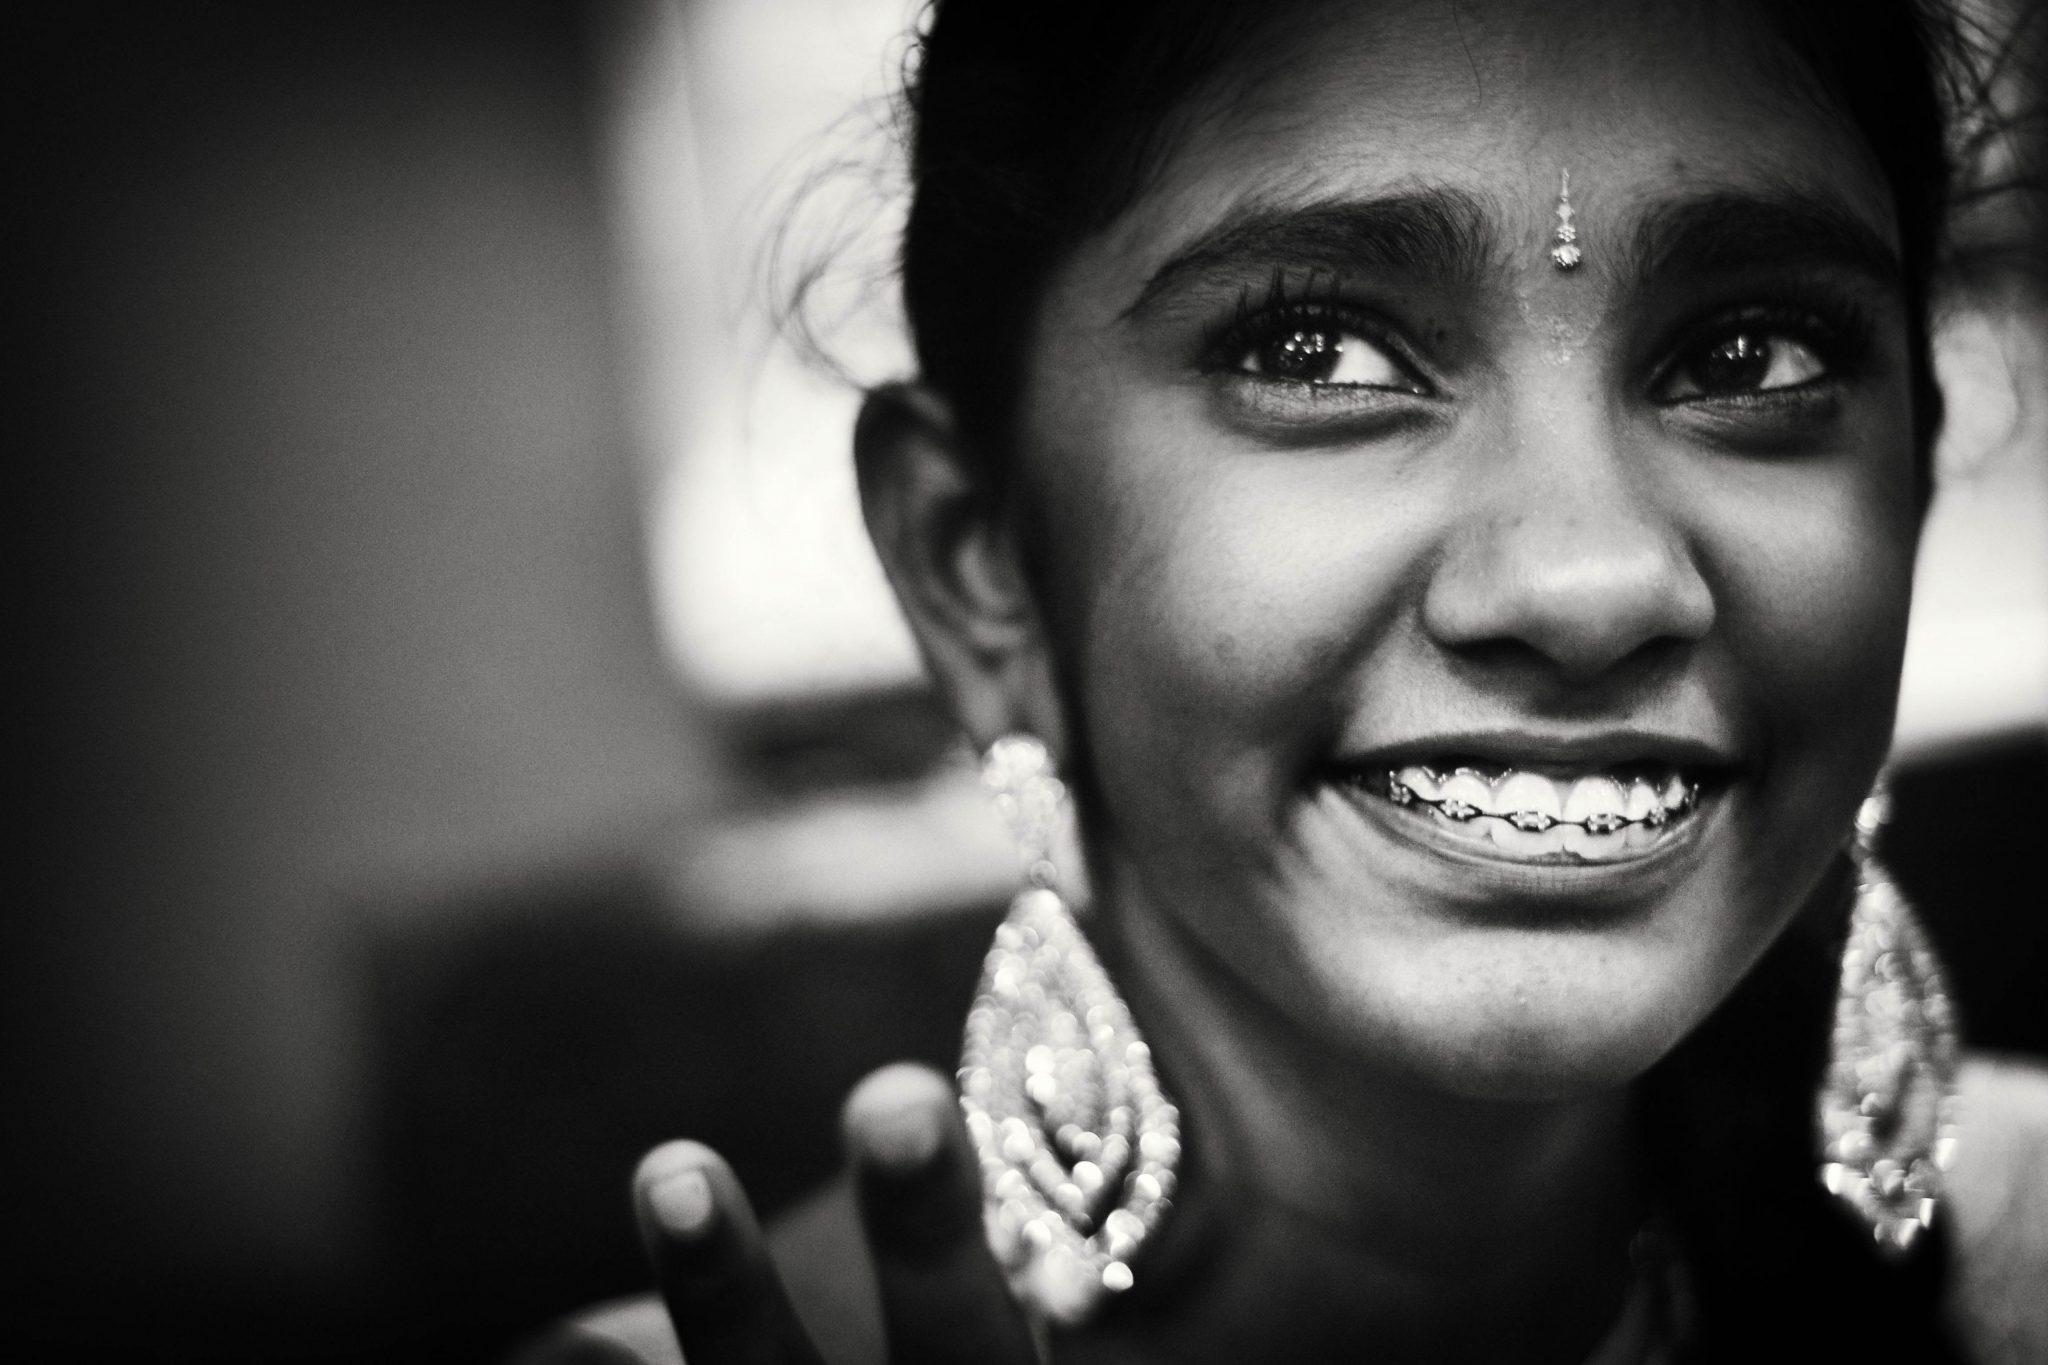 Smiling through memories photo